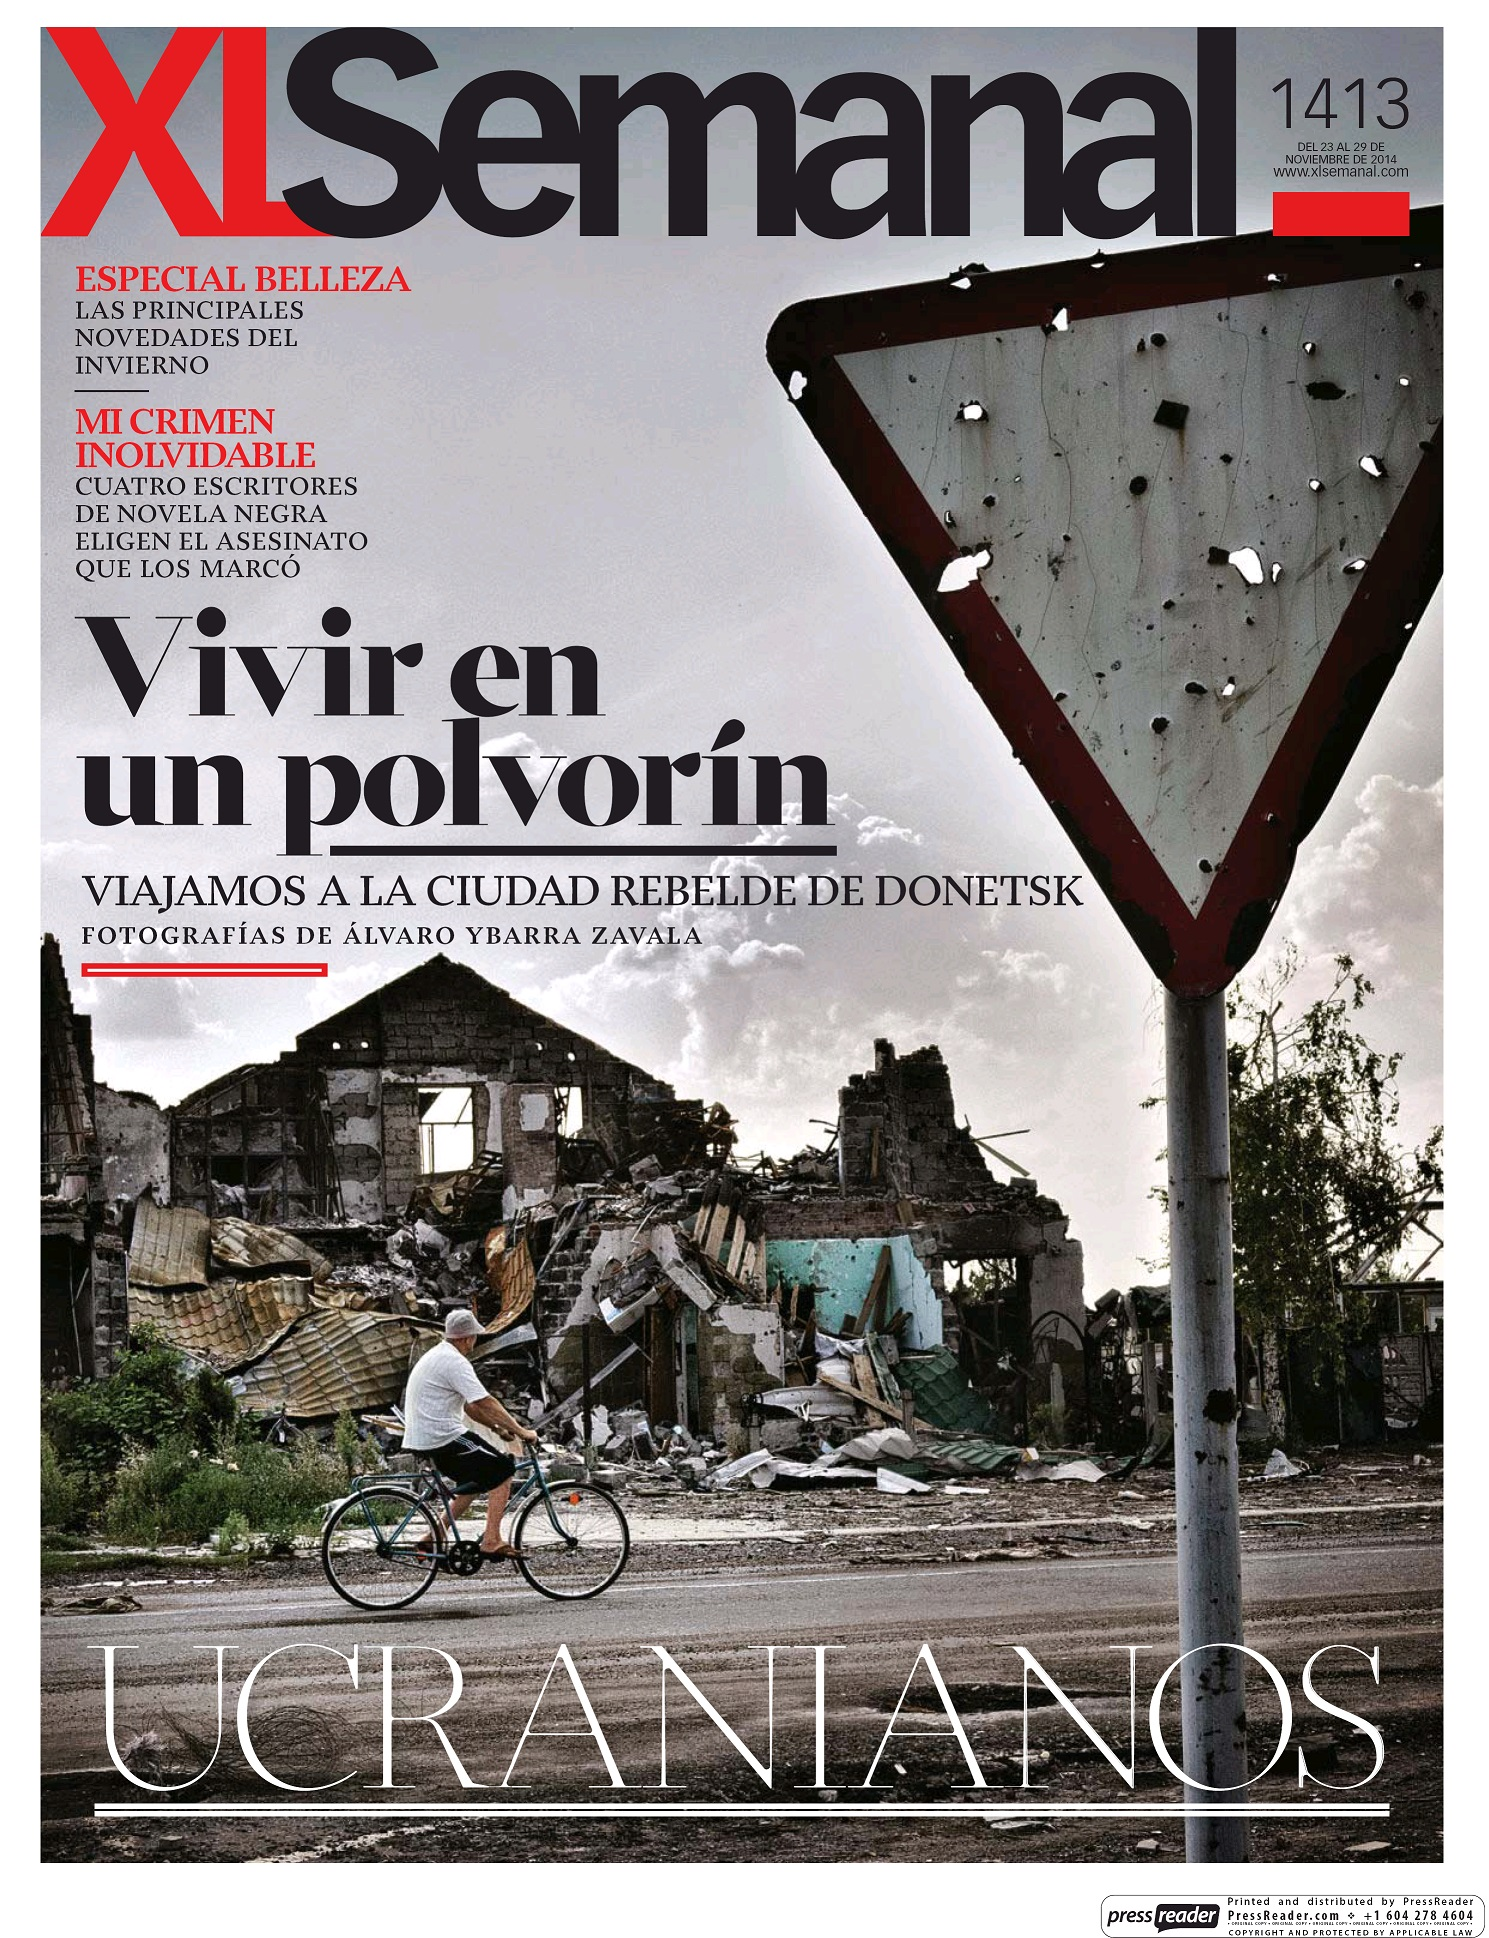 XL SEMANAL portada 23 de Noviembre 2014